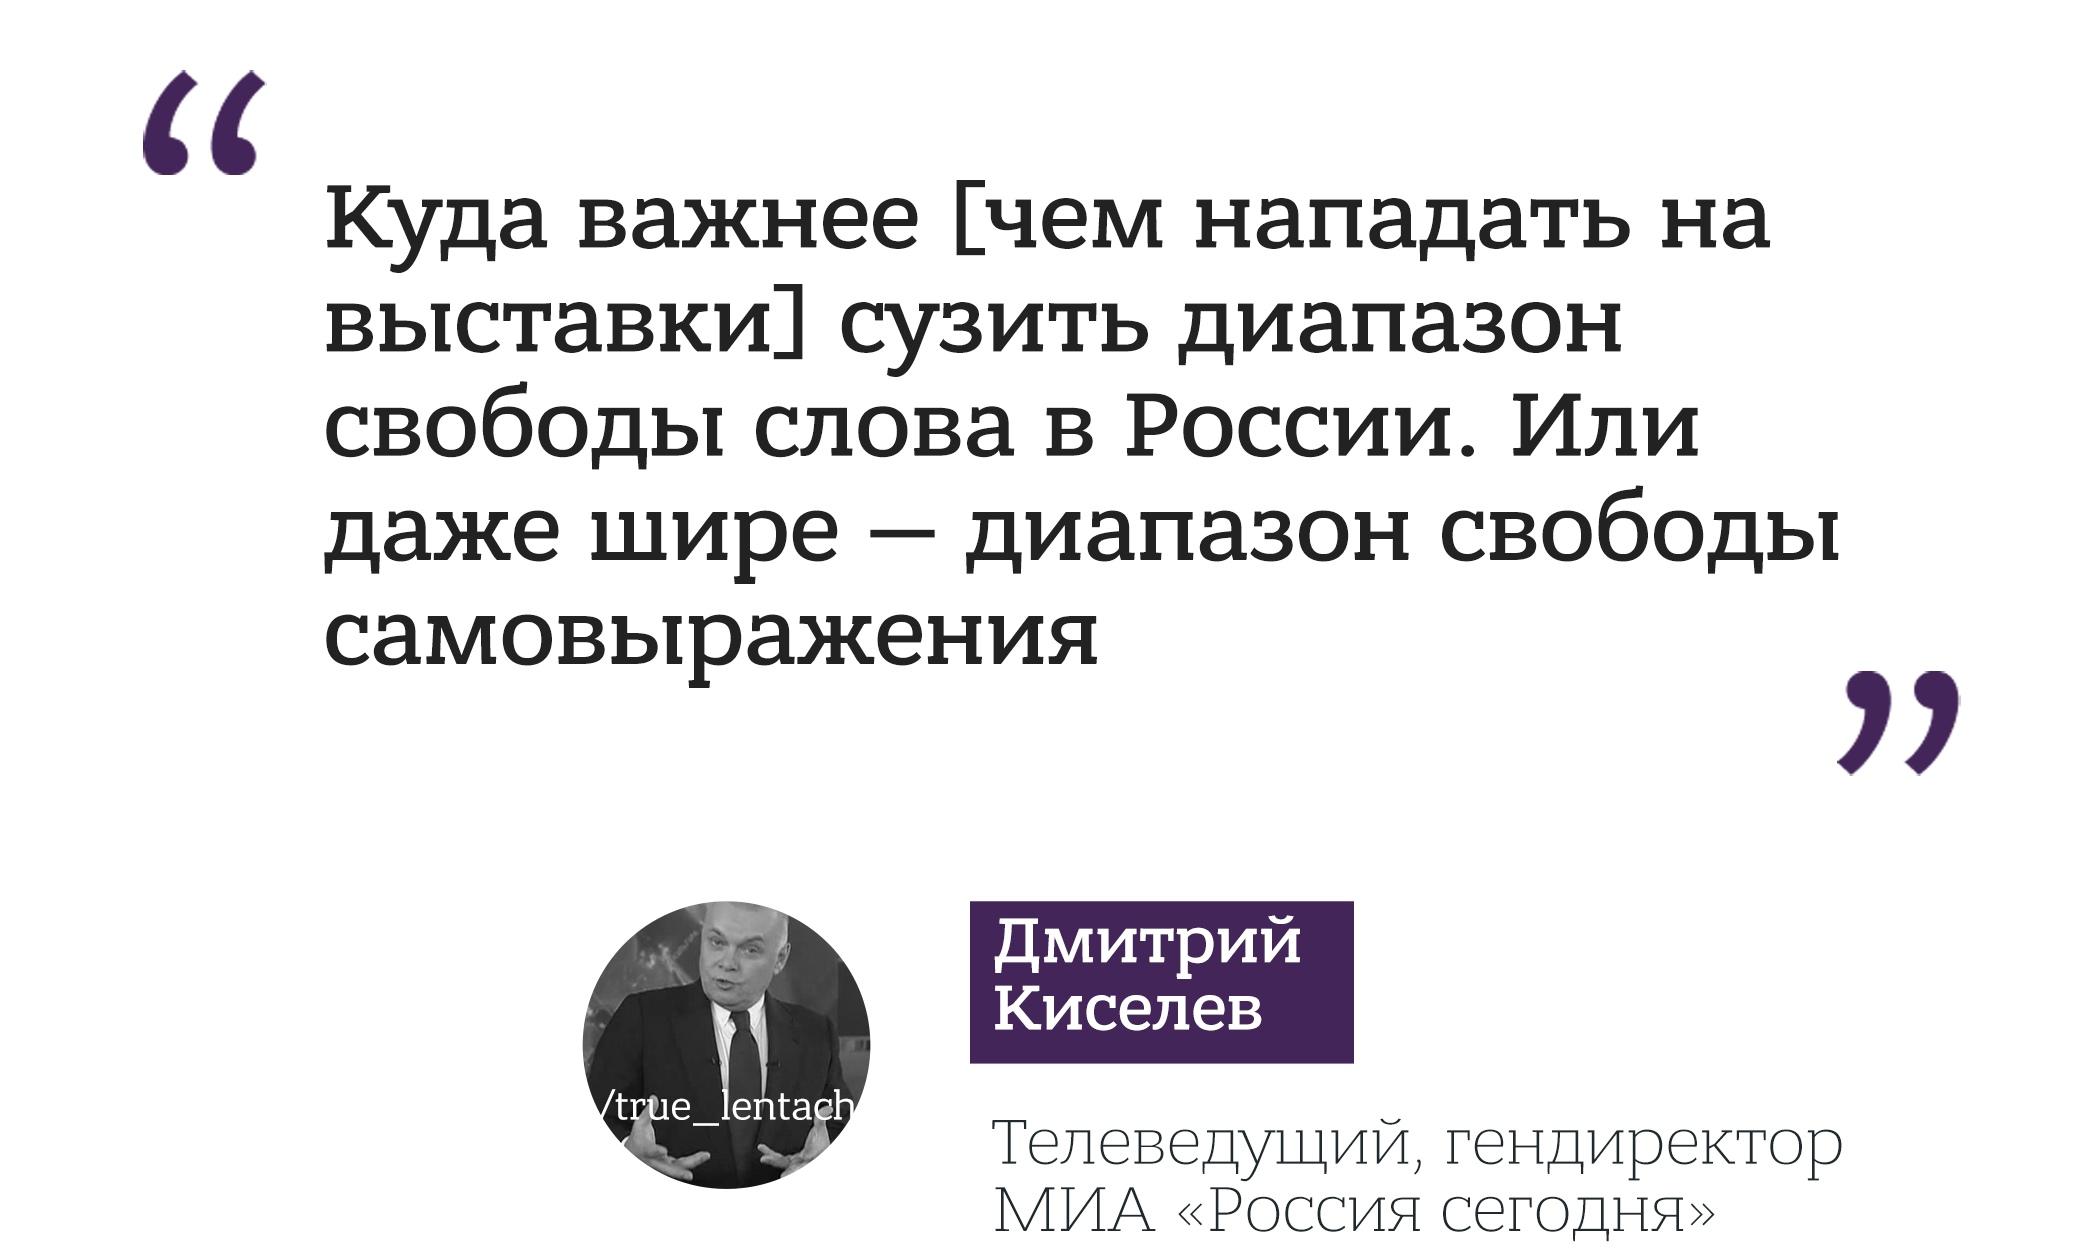 share.setitagila.ru/images/370174%D1%844.jpg